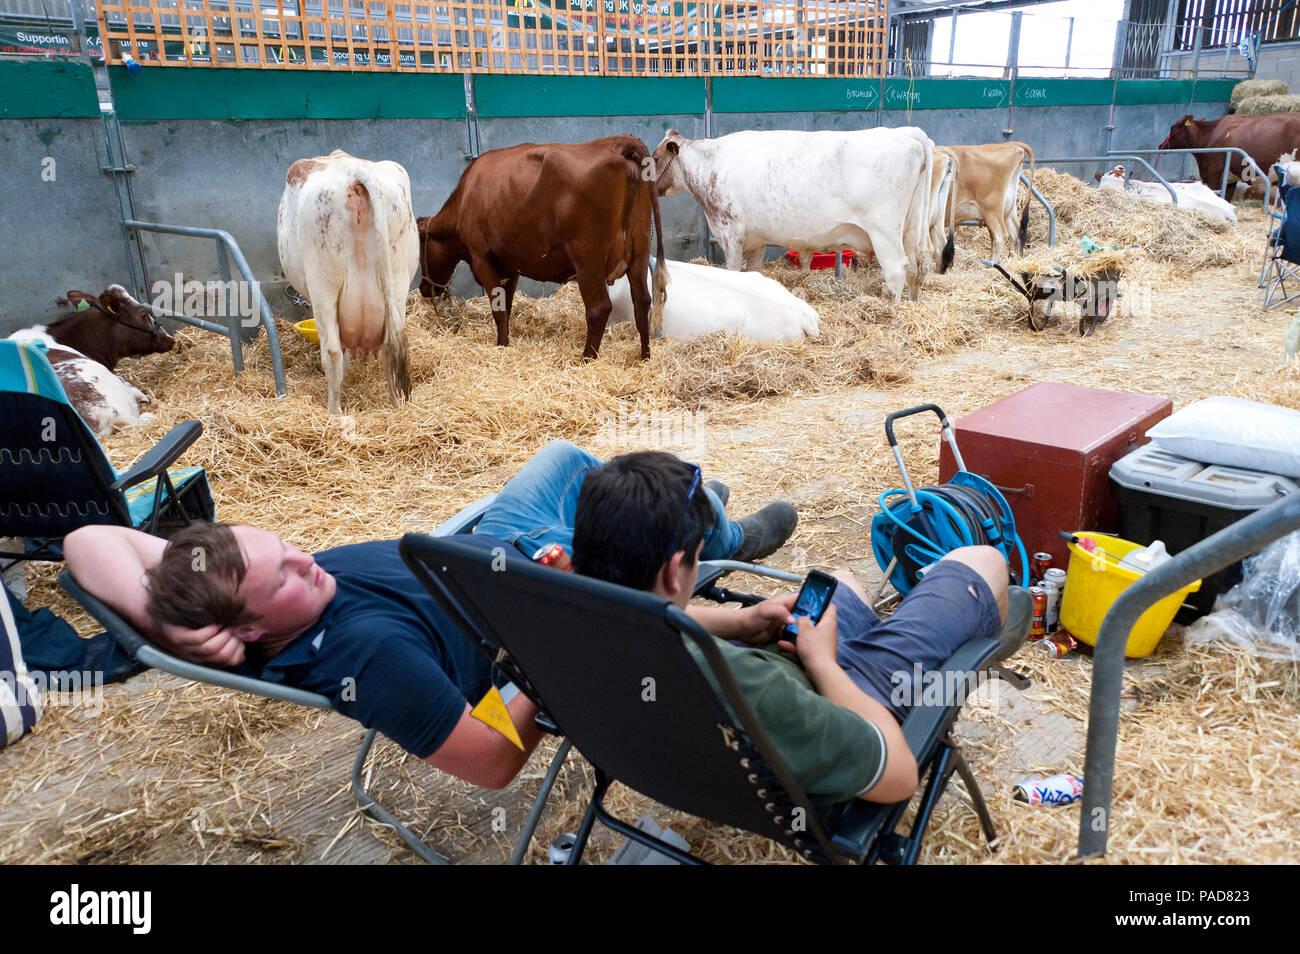 Llanelwedd, Powys, UK  22nd July 2017  People relax in the cattle